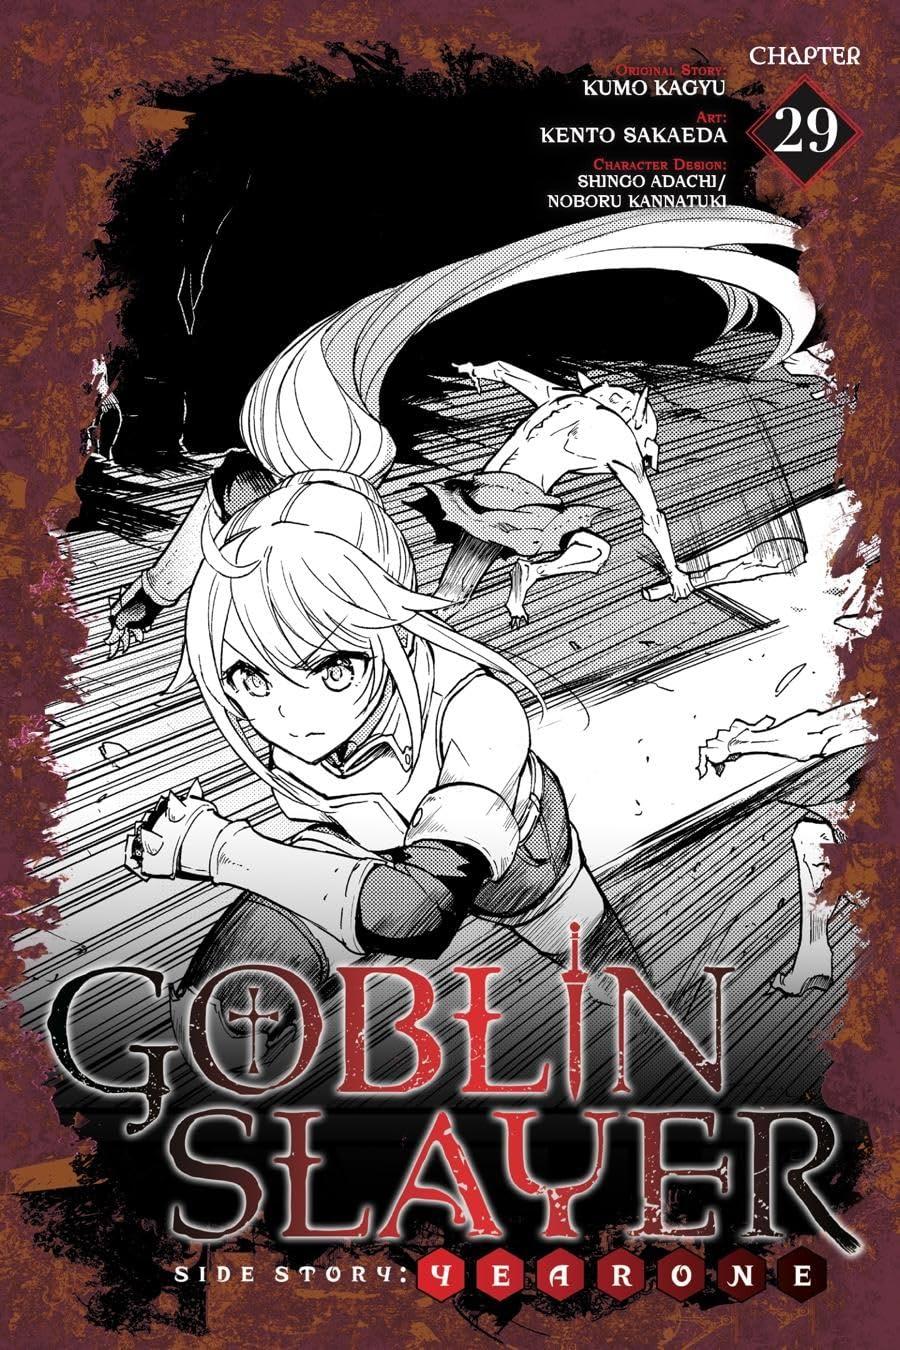 Goblin Slayer Side Story: Year One Vol. 29